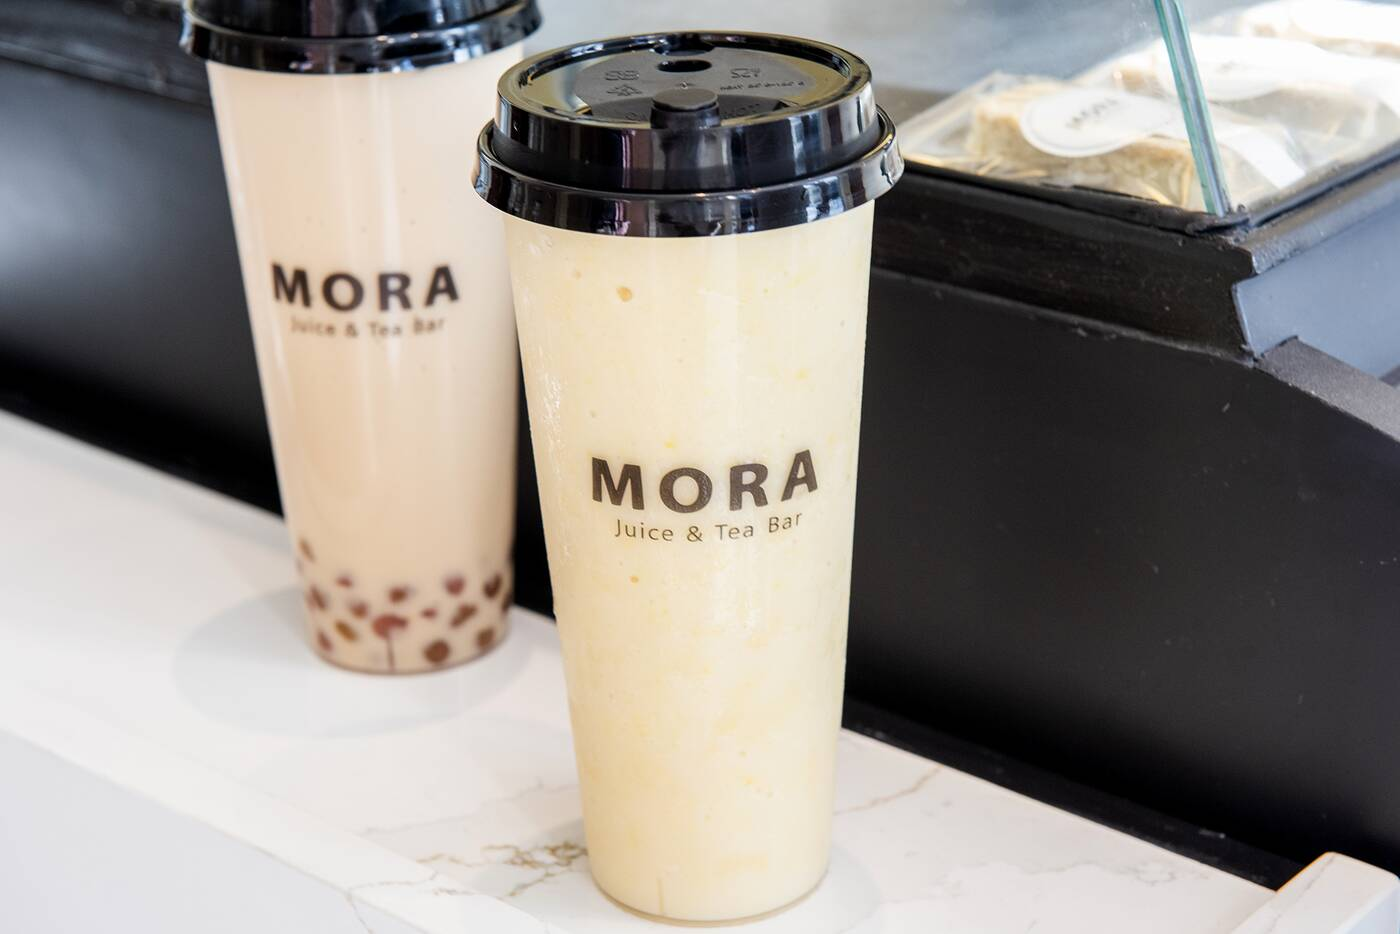 Mora Tea Bar